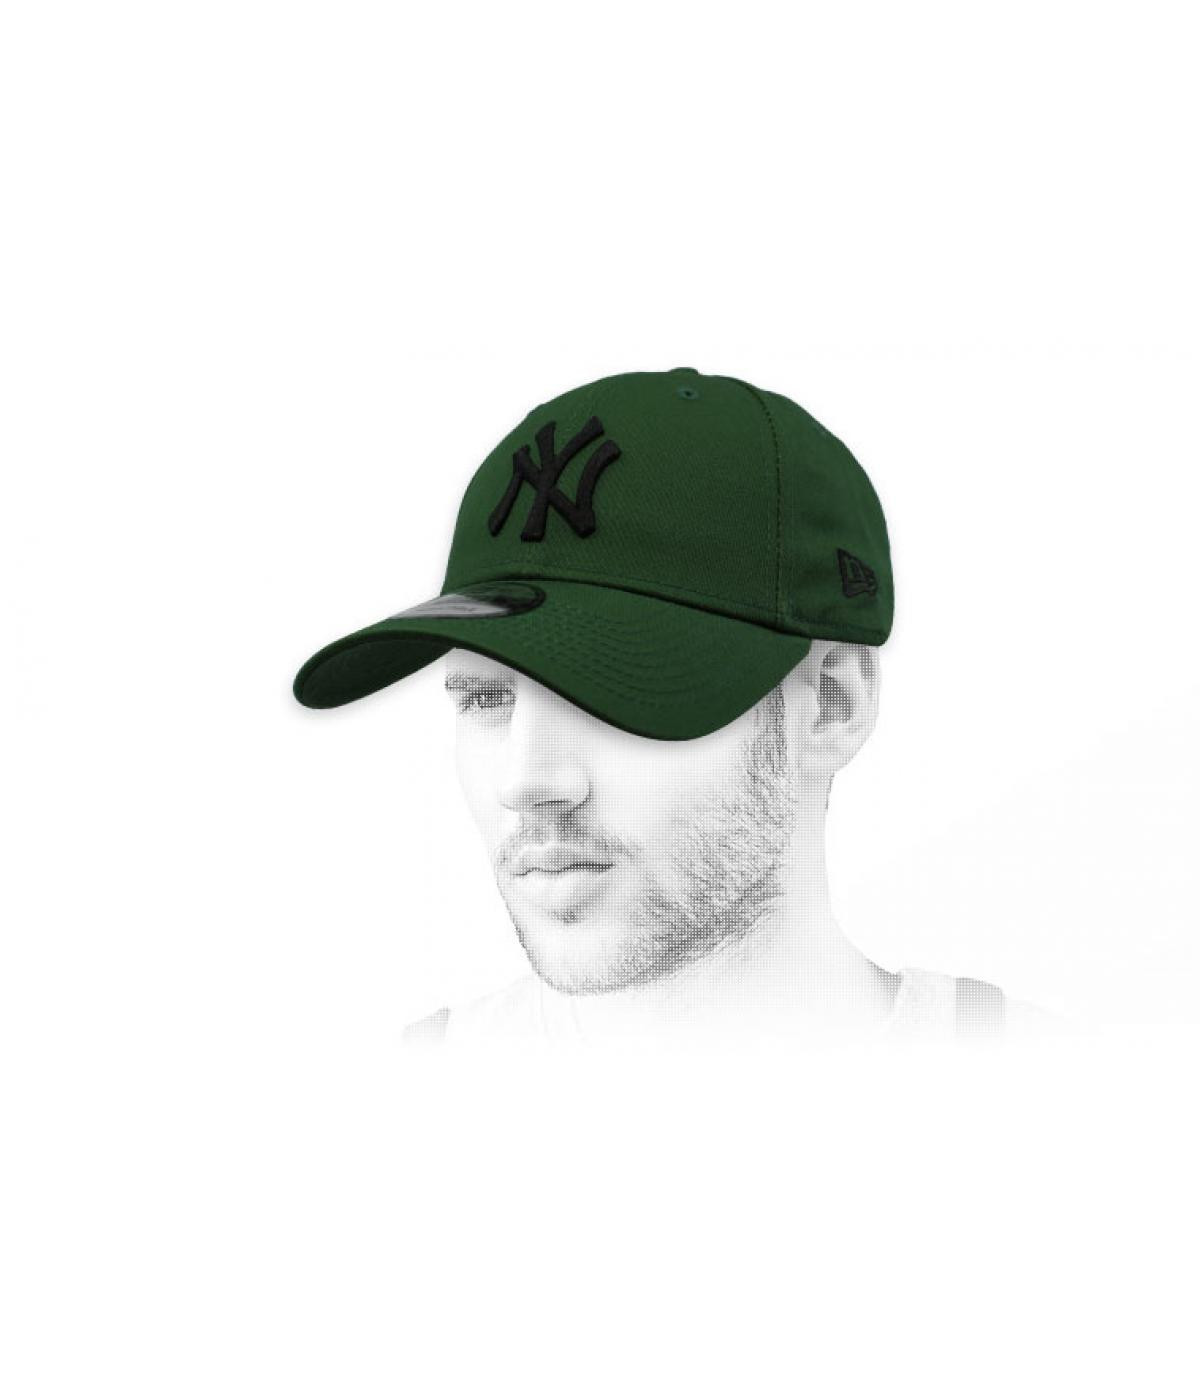 zwarte groene NY cap